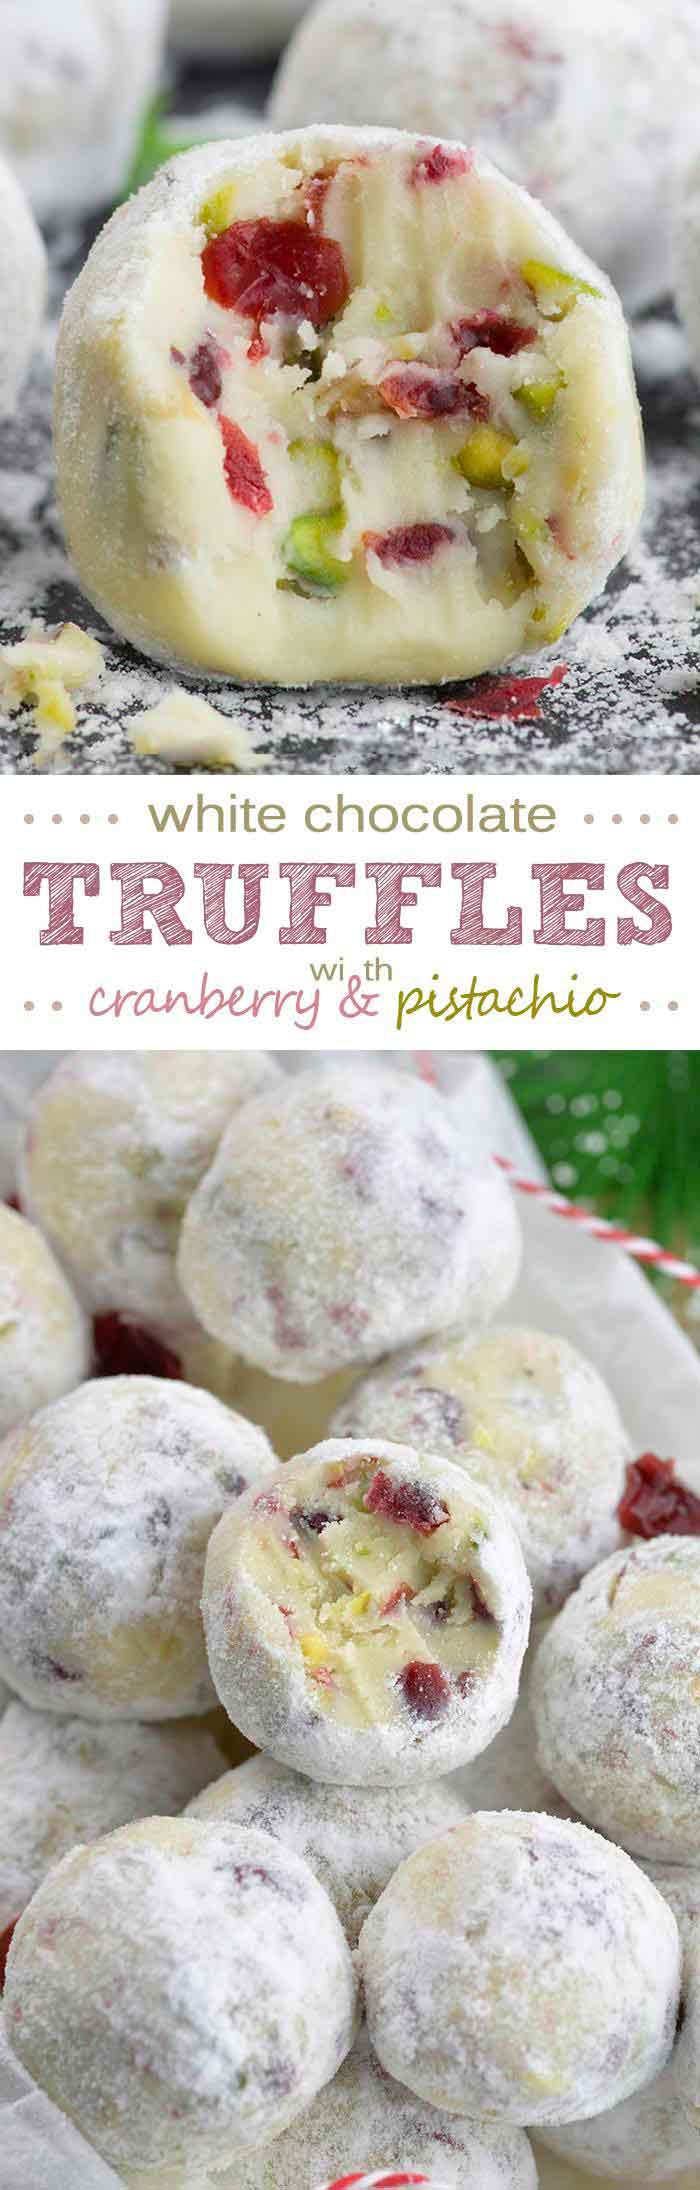 Christmas candy recipes - homemade truffles #christmascandy #truffles